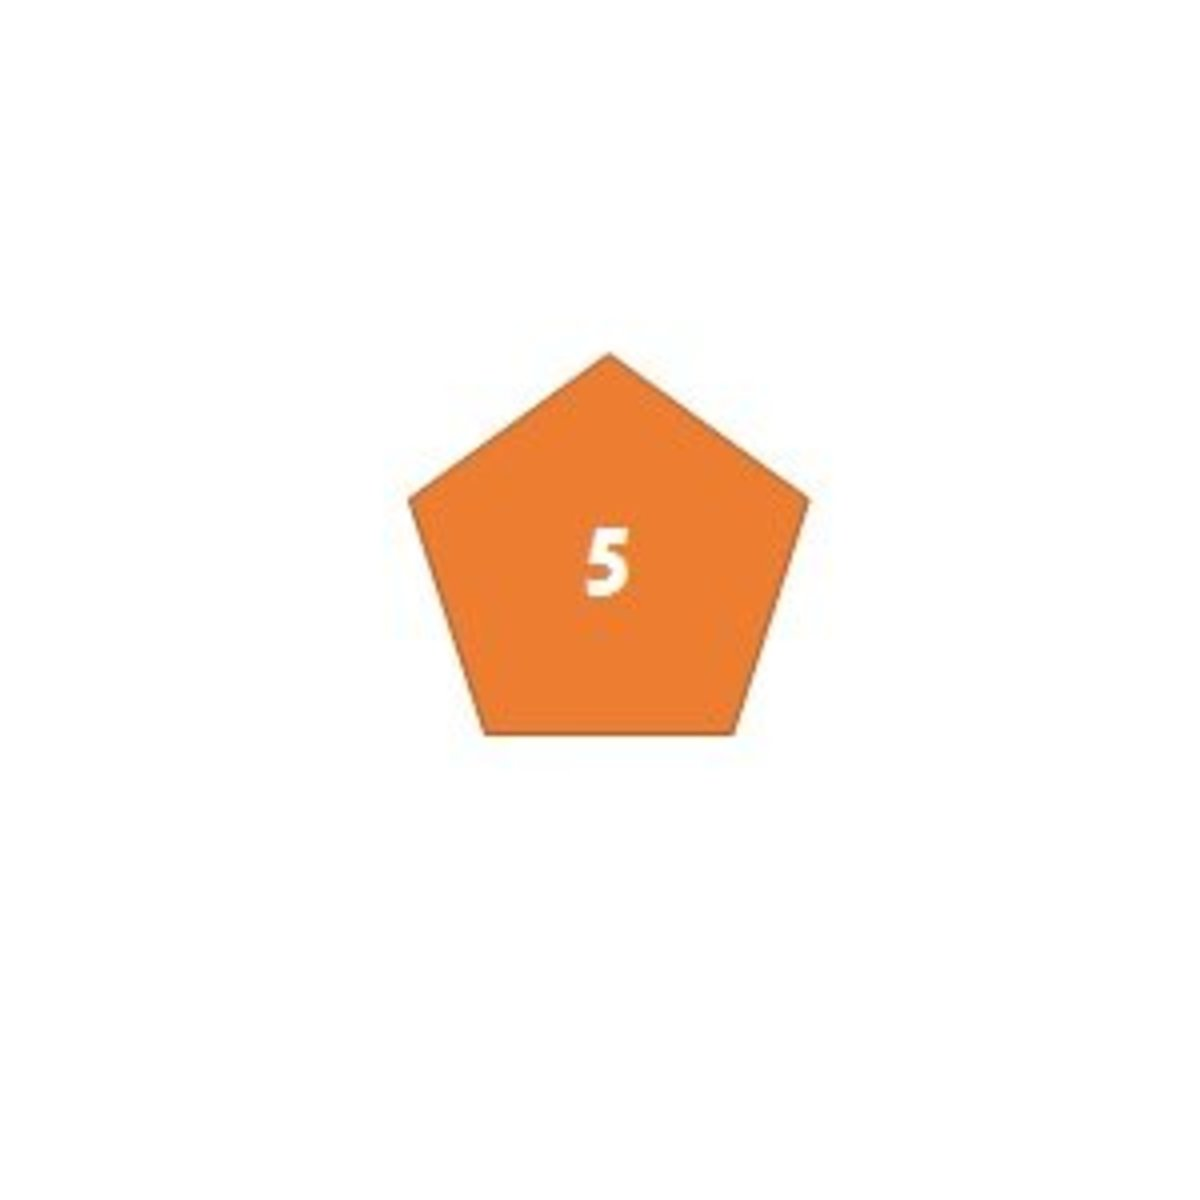 A pentagon has 5 sides.